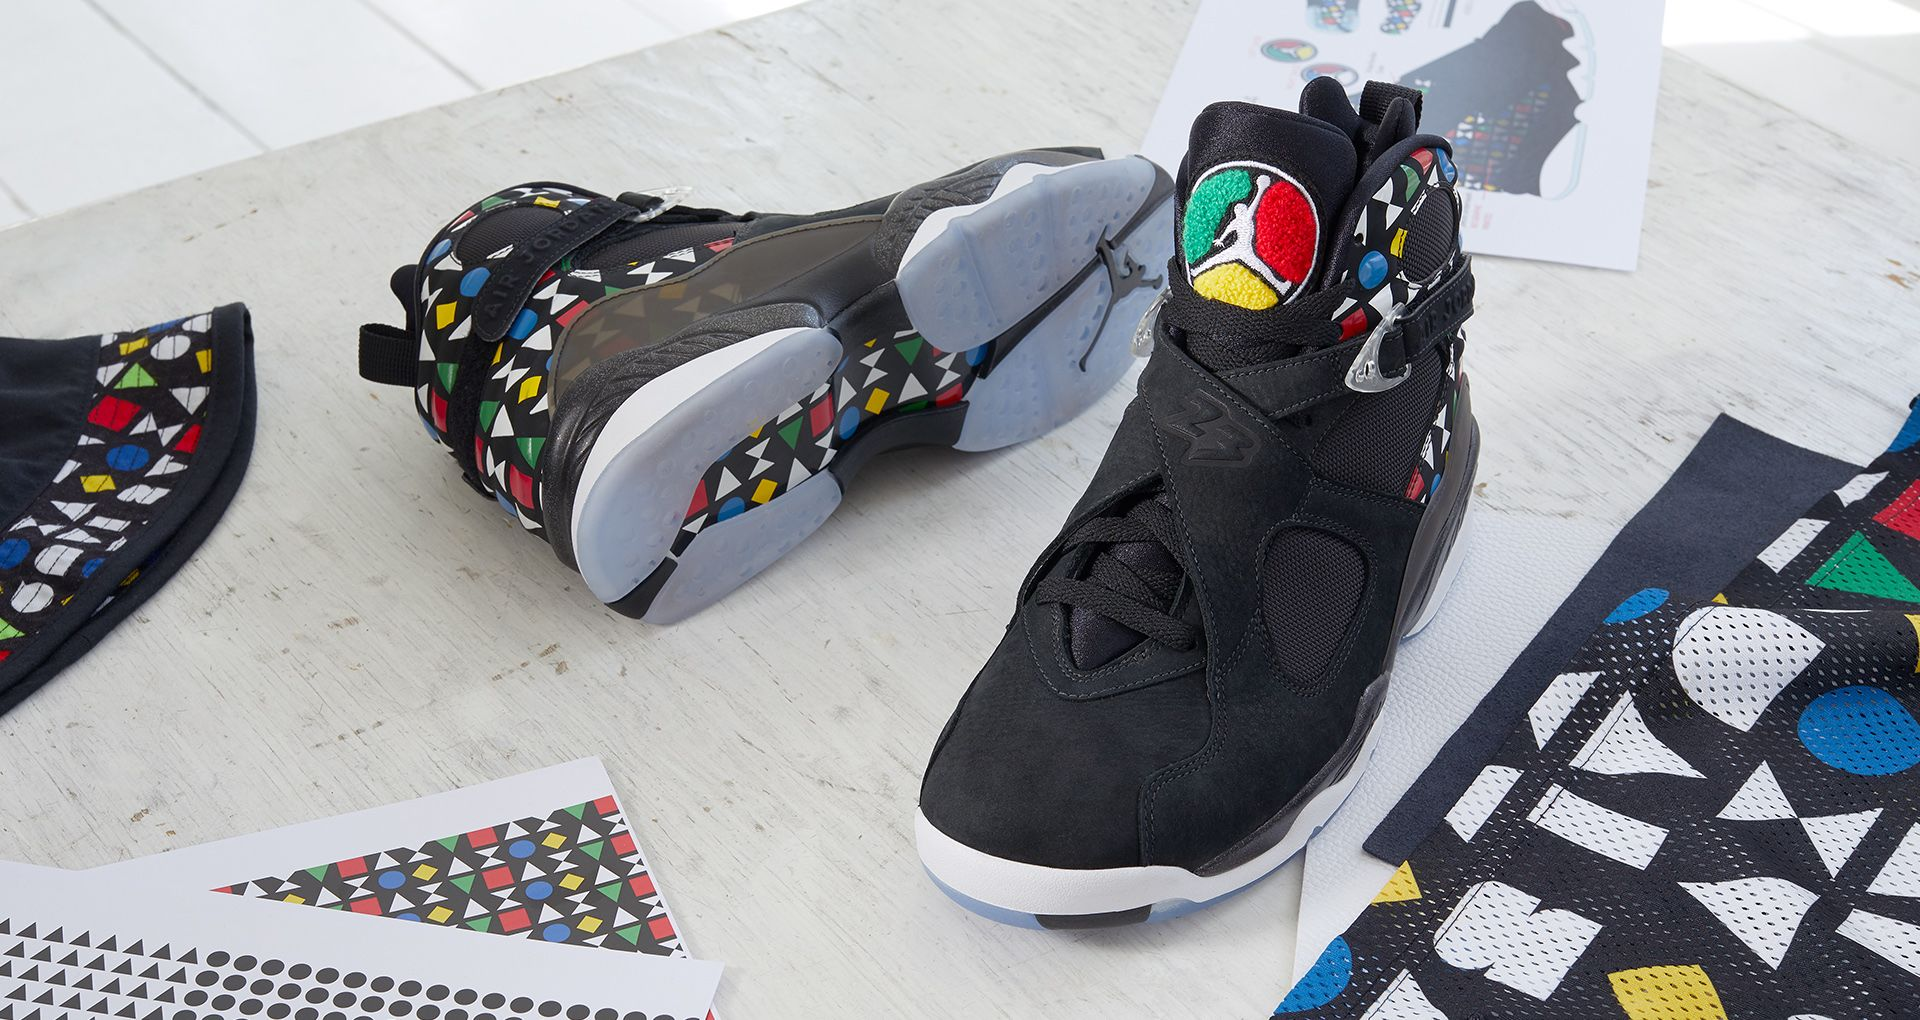 new style 0d5f4 dcf3c Behind The Design: Air Jordan 8 'QUAI 54'. Nike+ Launch FI